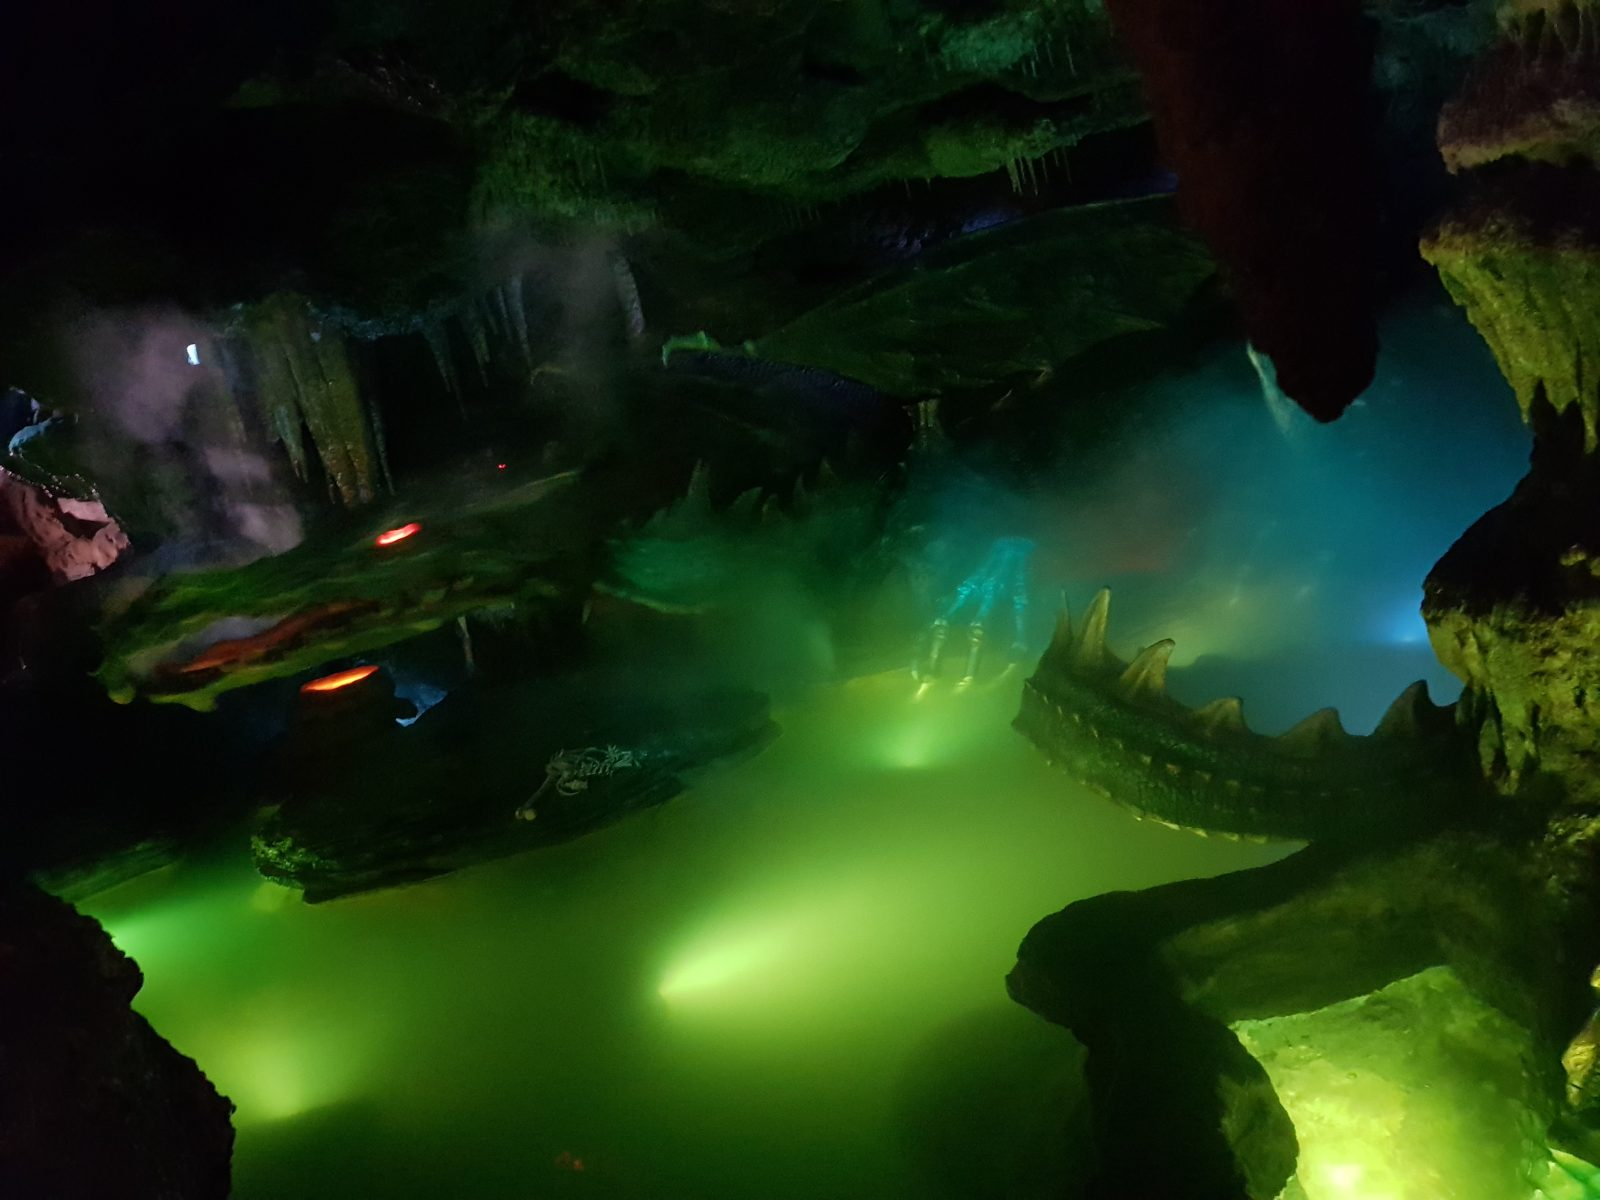 The dragon underneath the Sleeping Beauty castle at Disneyland Paris